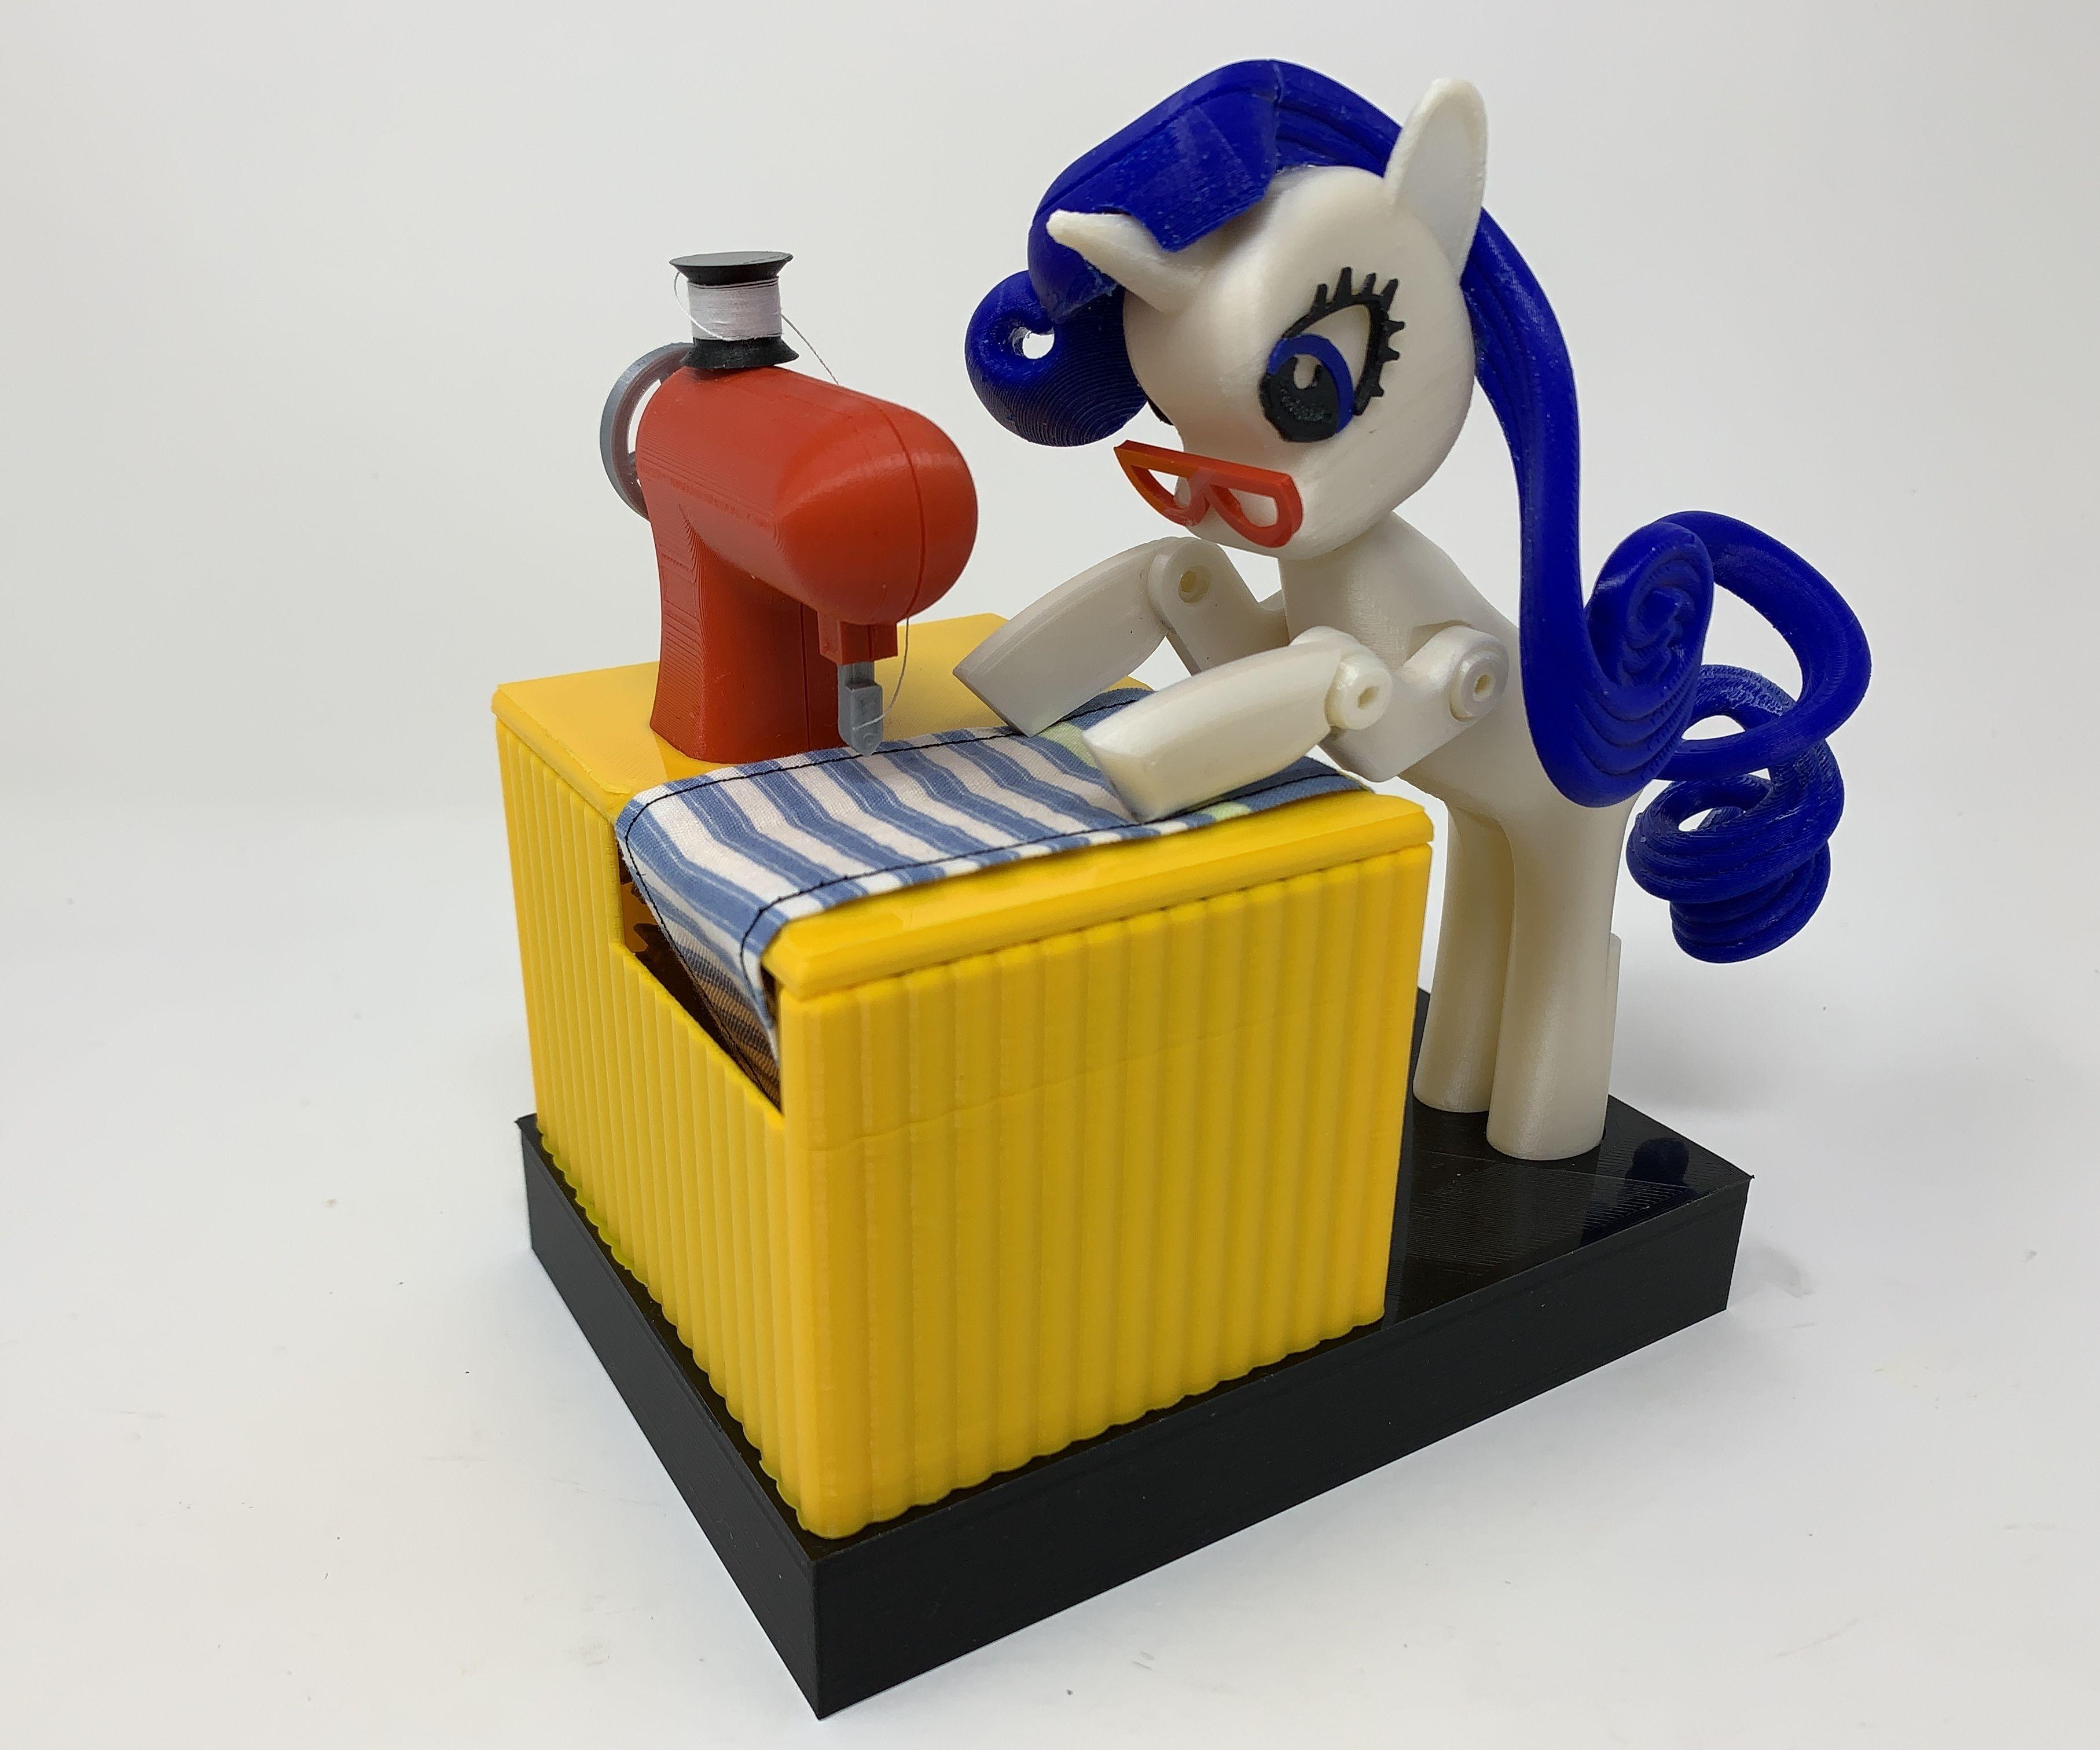 """Rarity"", a 3D Printed Automaton"